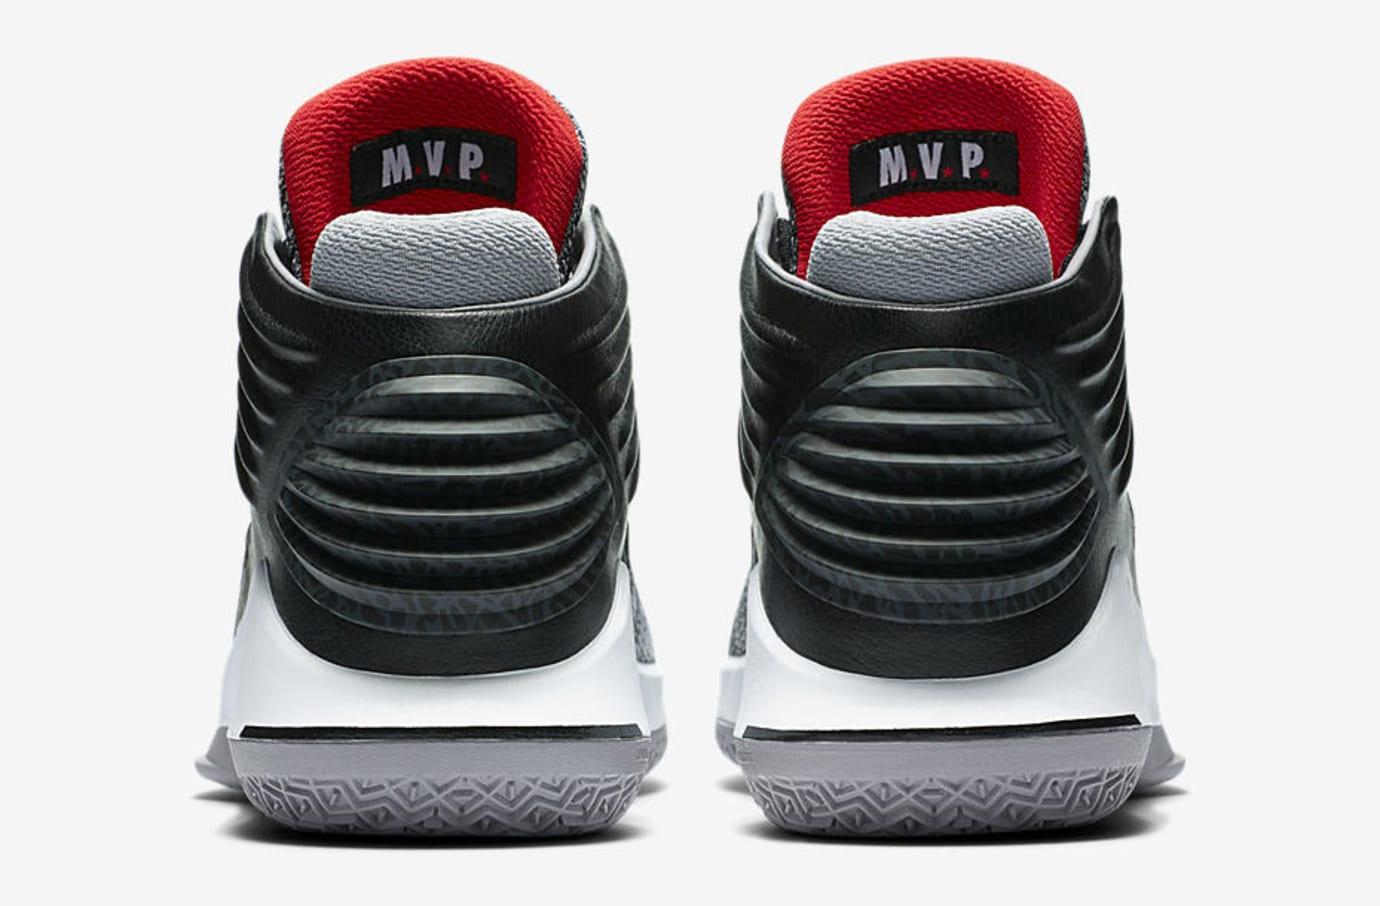 Air Jordan 32 MVP Black Cement AA1253-002 Heel